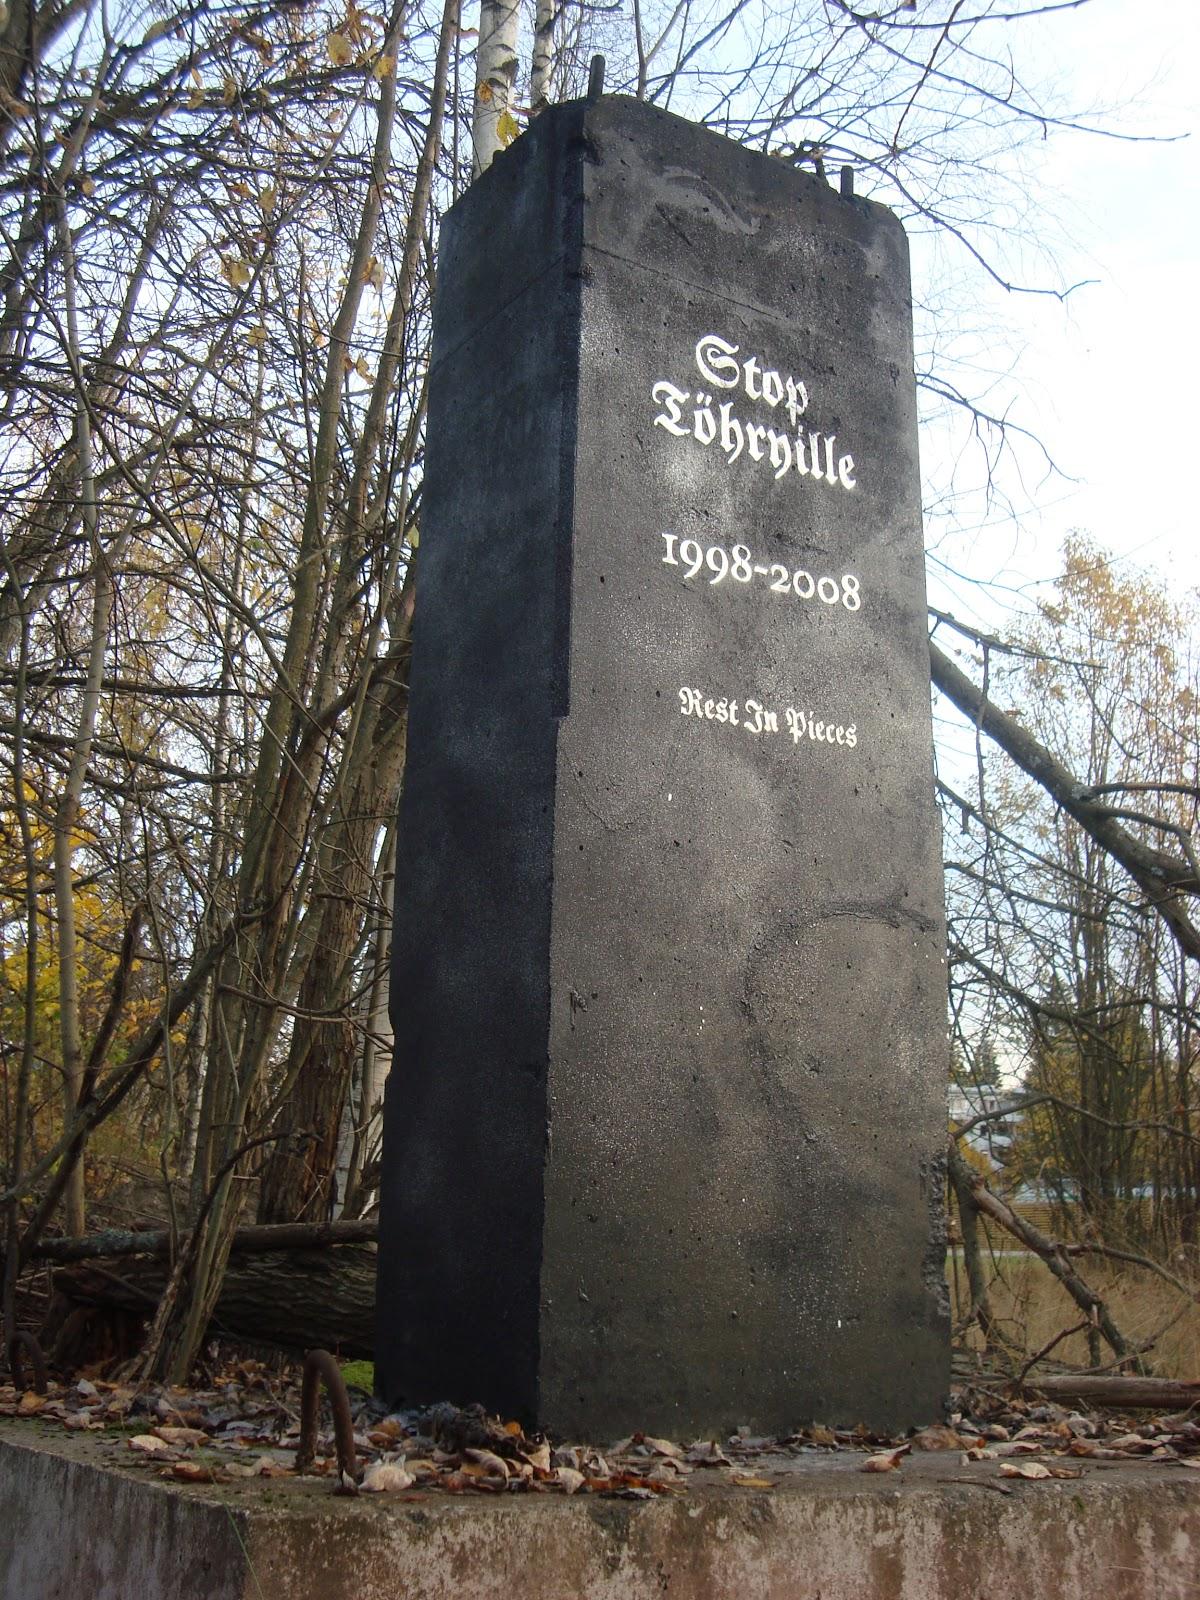 Stop Töhryille